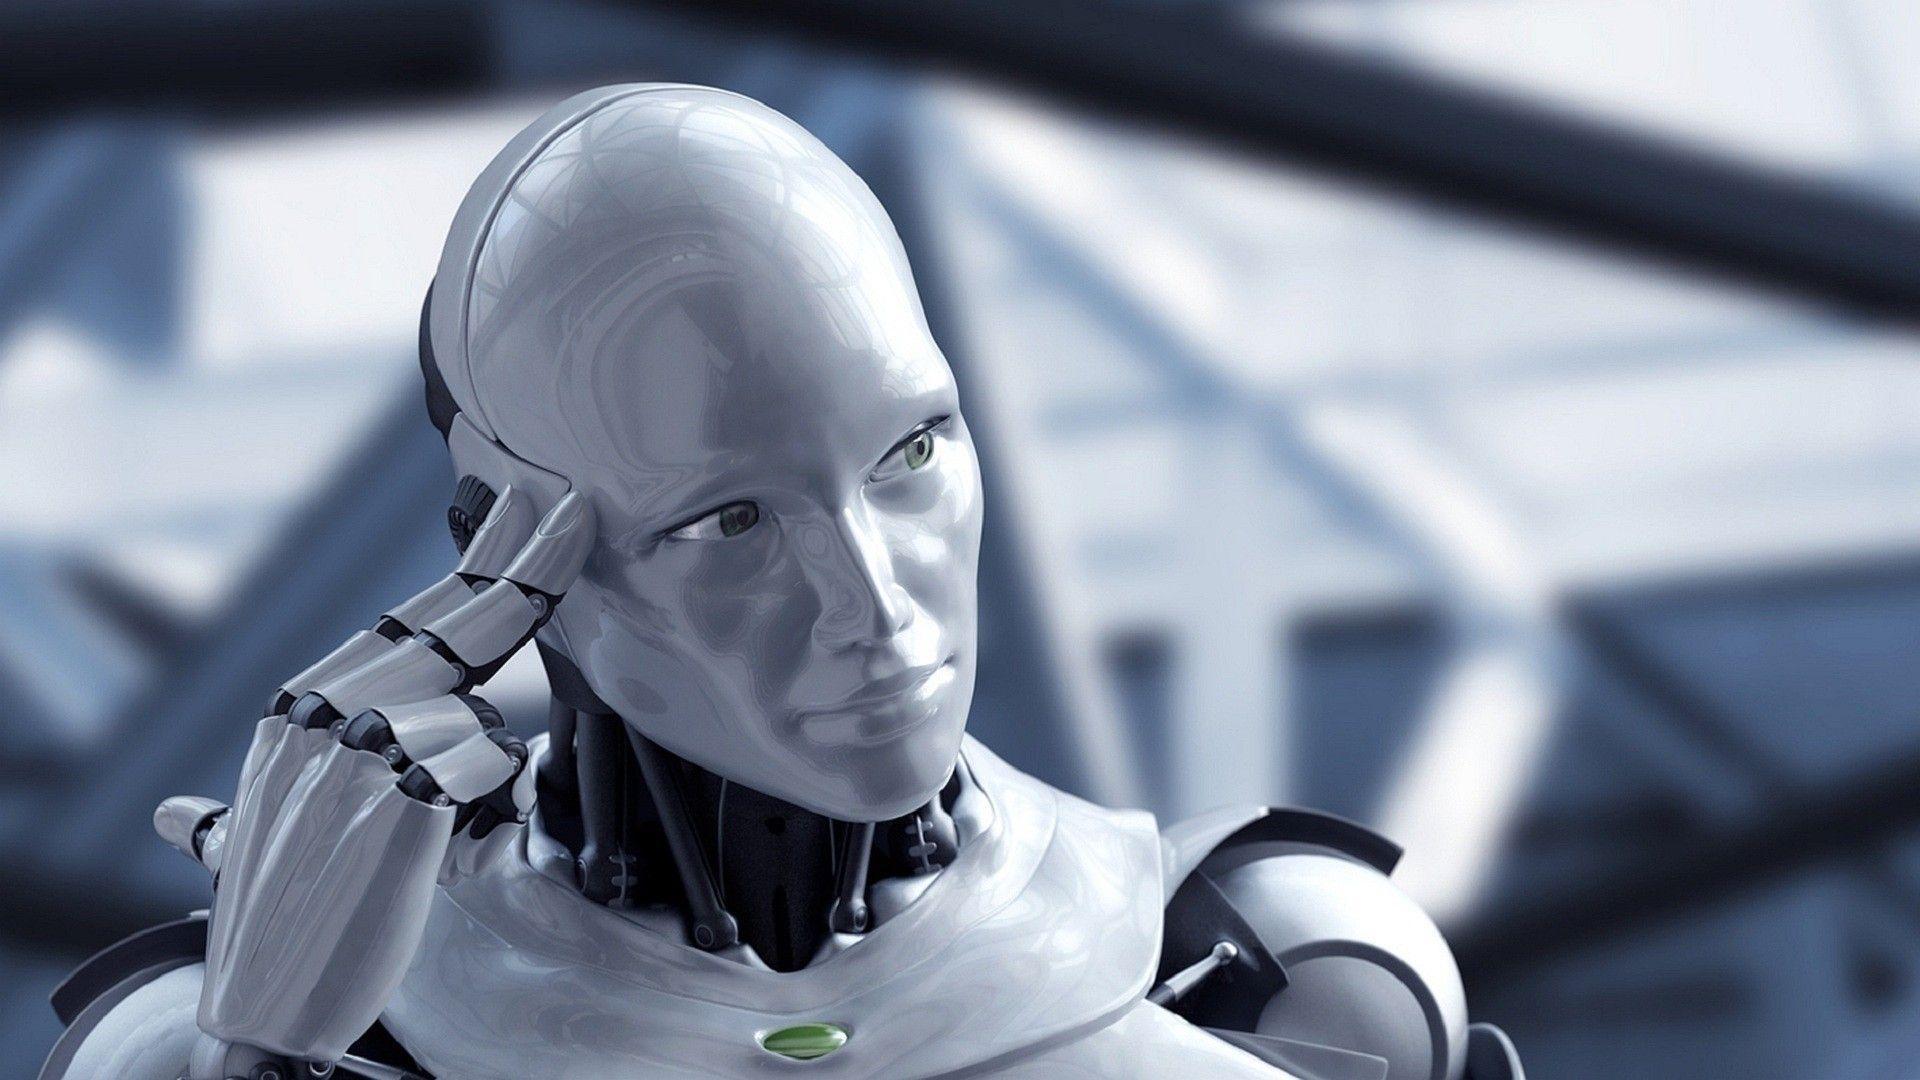 Cute Robot Desktop Backgrounds HD 9112 HD Wallpapers Site